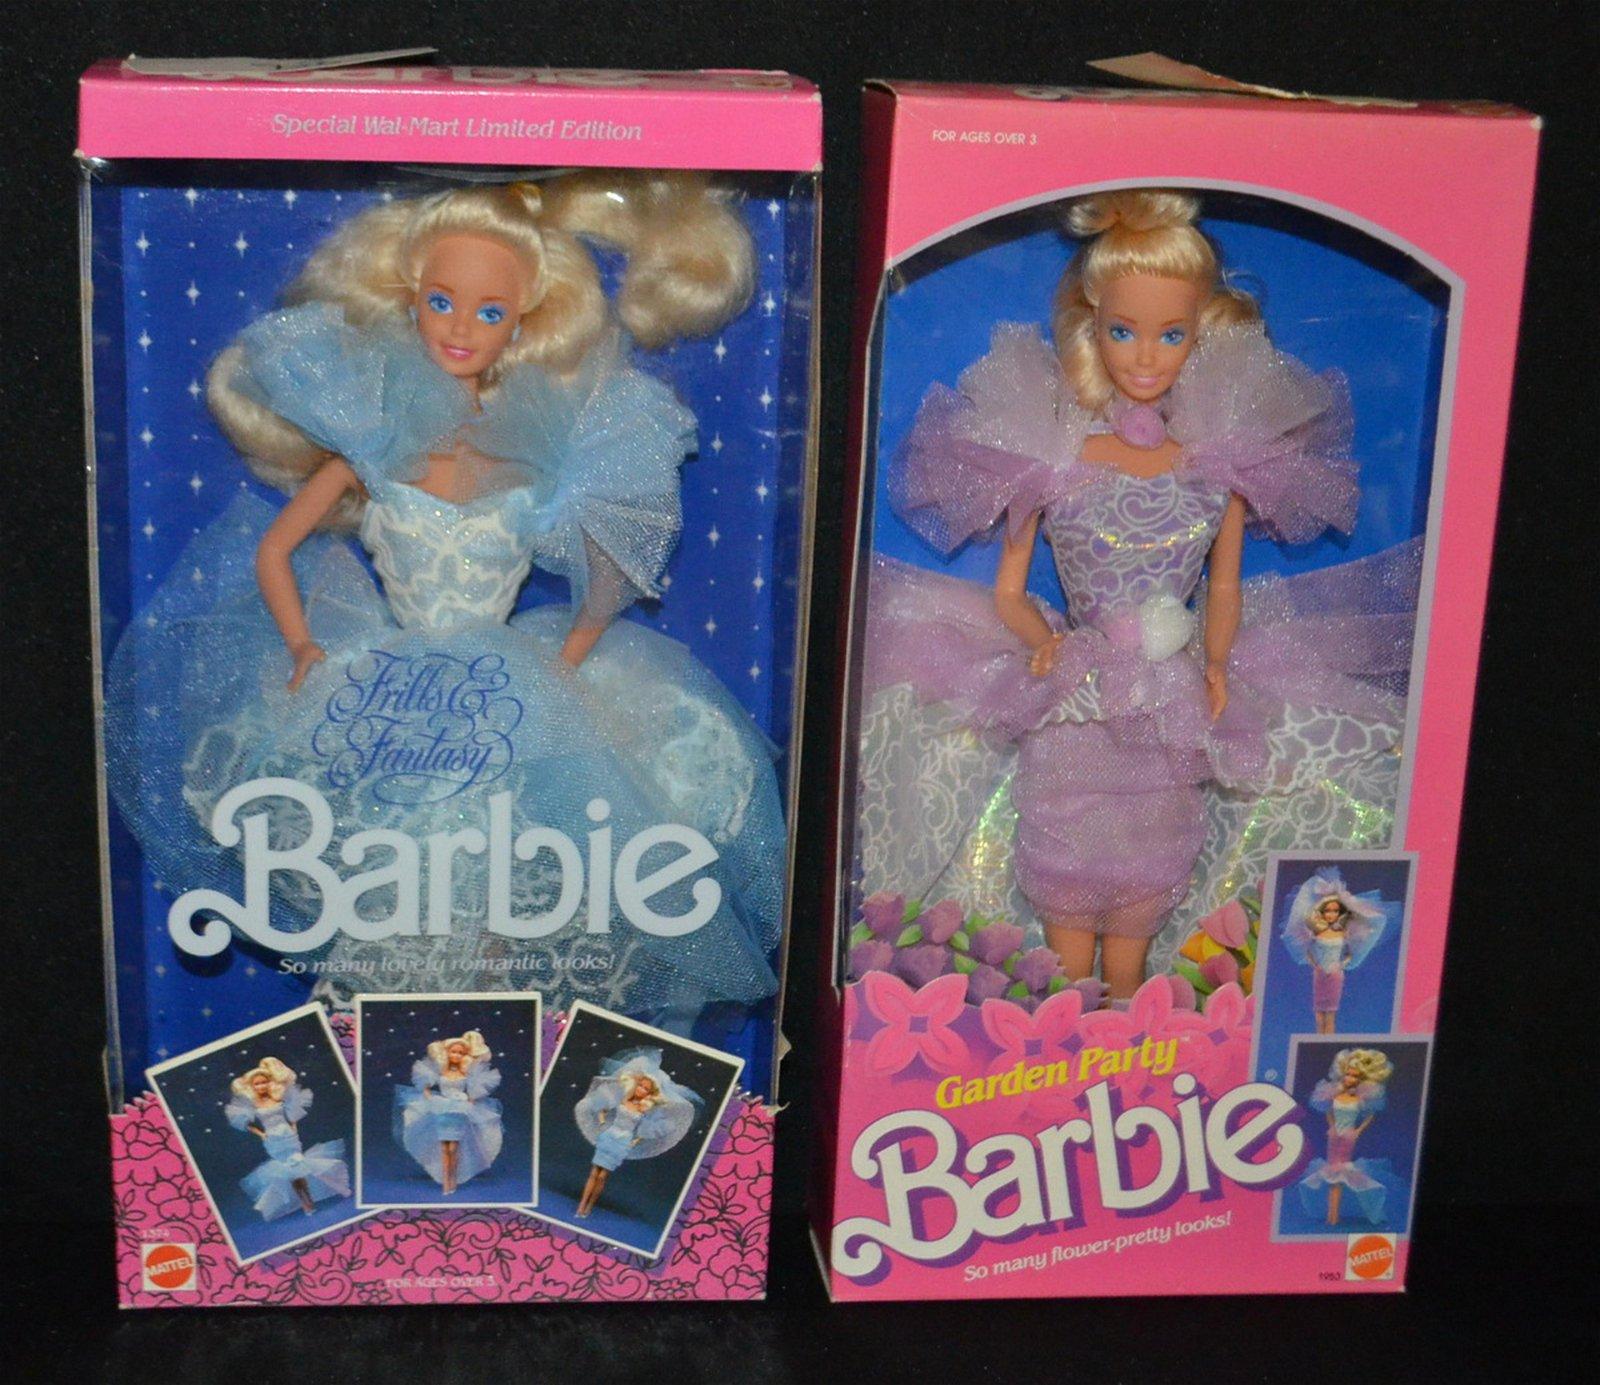 1994 Mattel Baywatch Barbie And Ken Doll Lot Of 2 Dolls NRFB